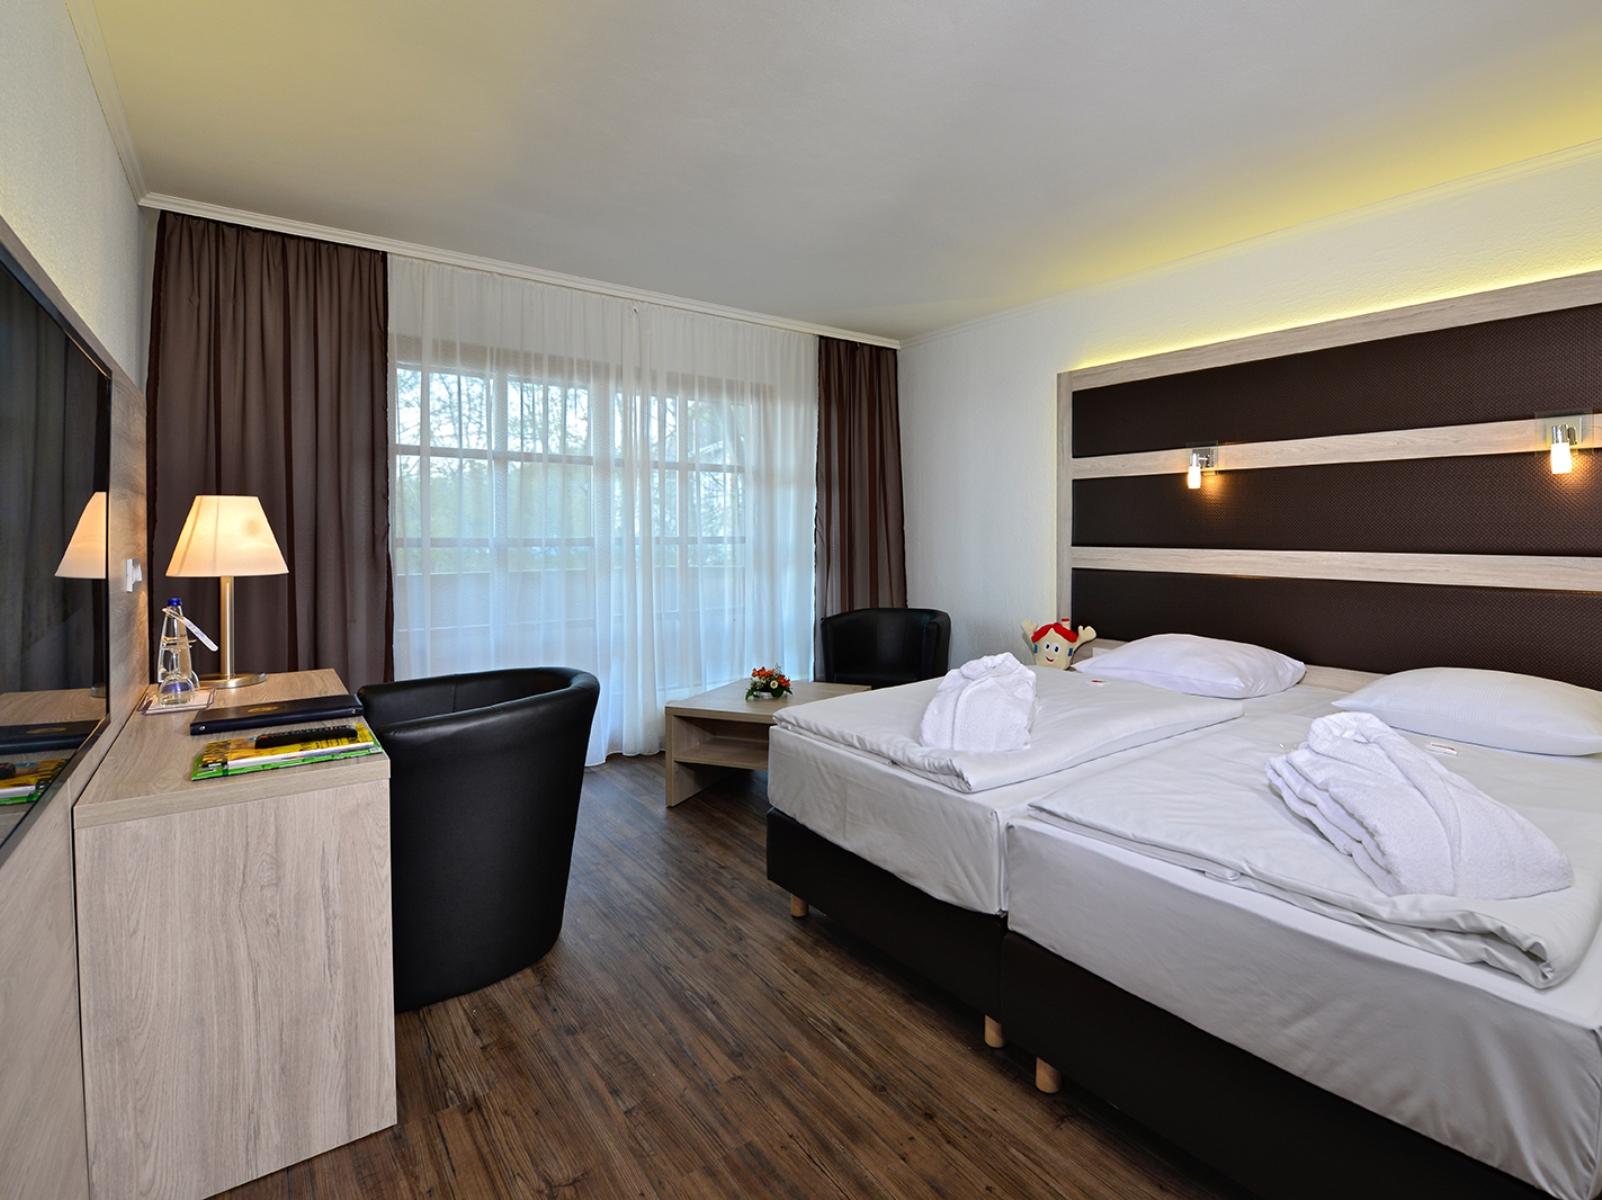 michel-friends-hotel-waldkirchen thumbnail